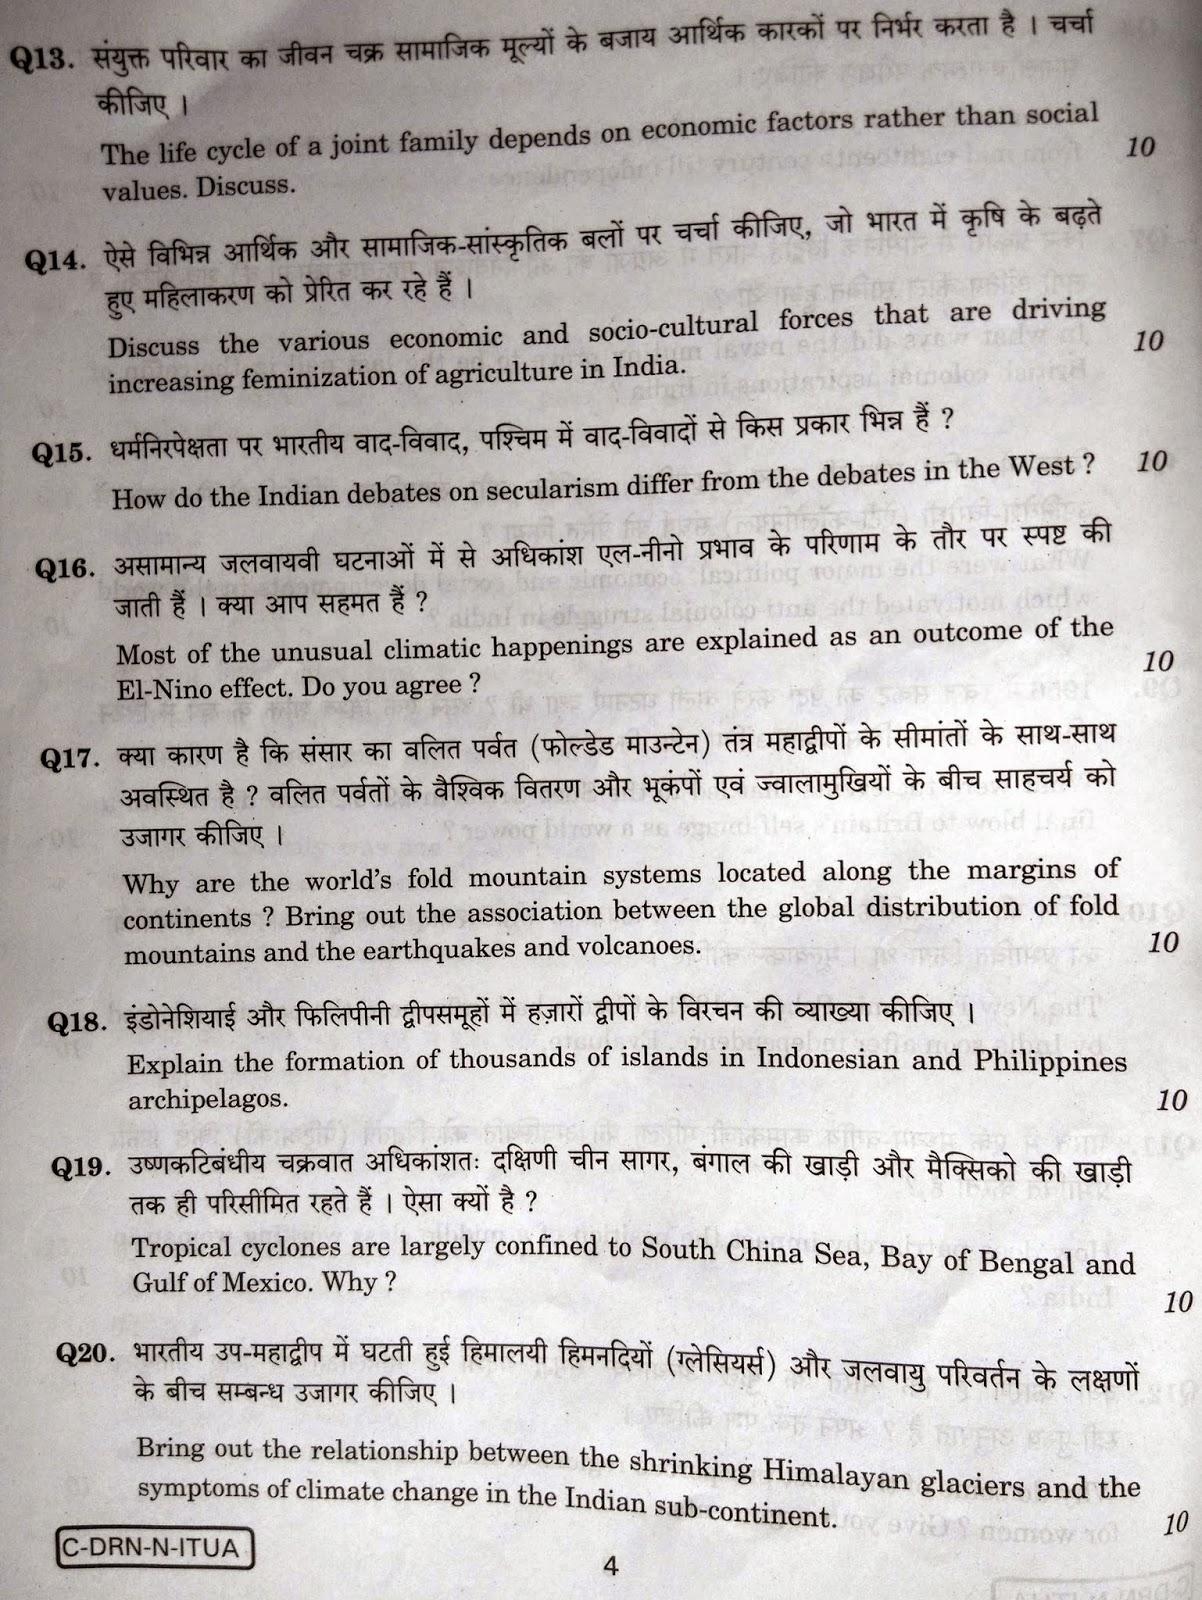 UPSC IAS Civil Services Mains       GEOGRAPHY Optional Question     Mrunal